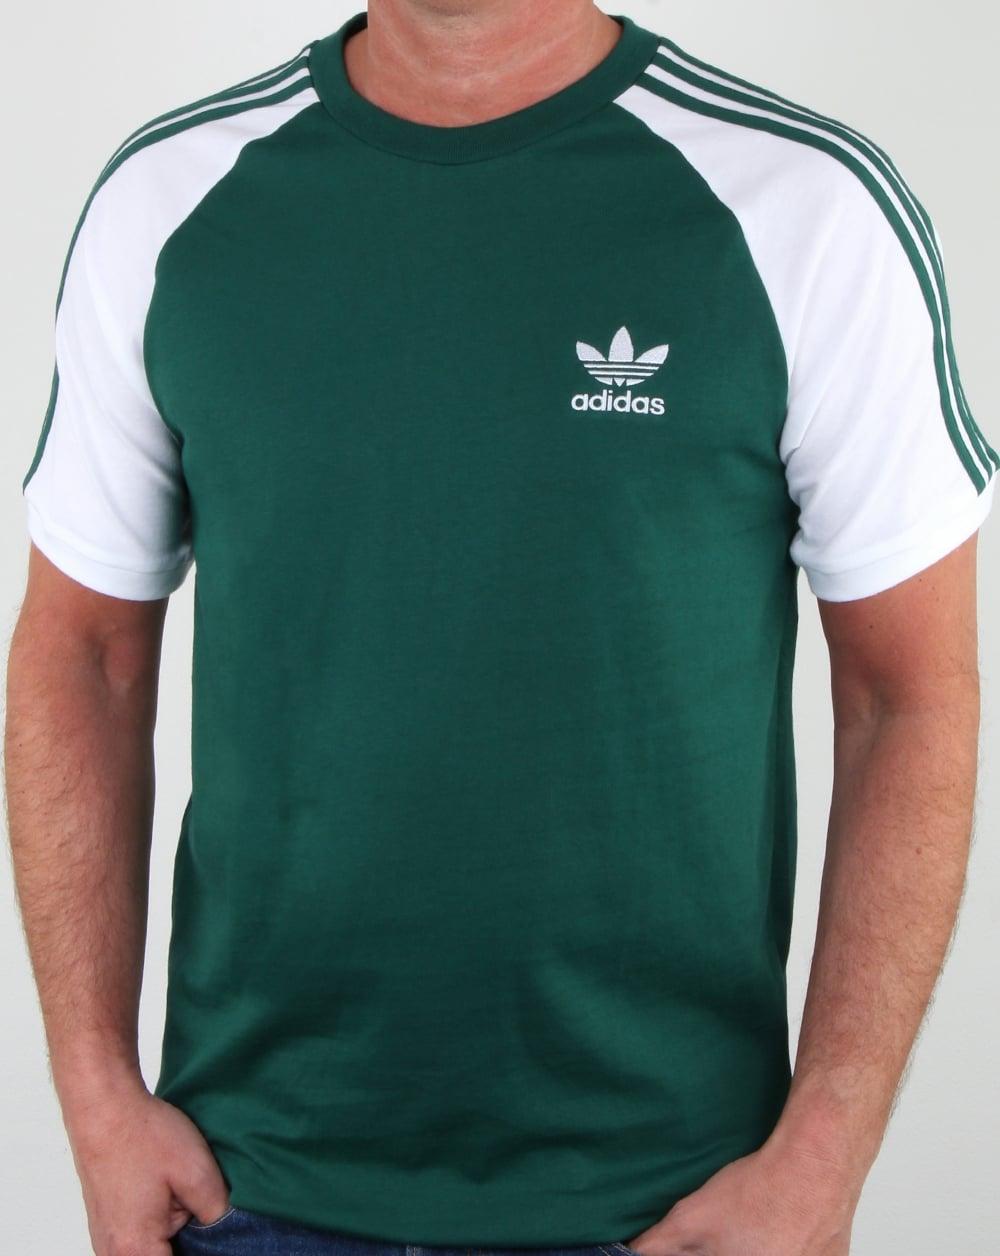 02d8b72bb12 adidas Originals Adidas Originals 3 Stripes T Shirt DP Green White